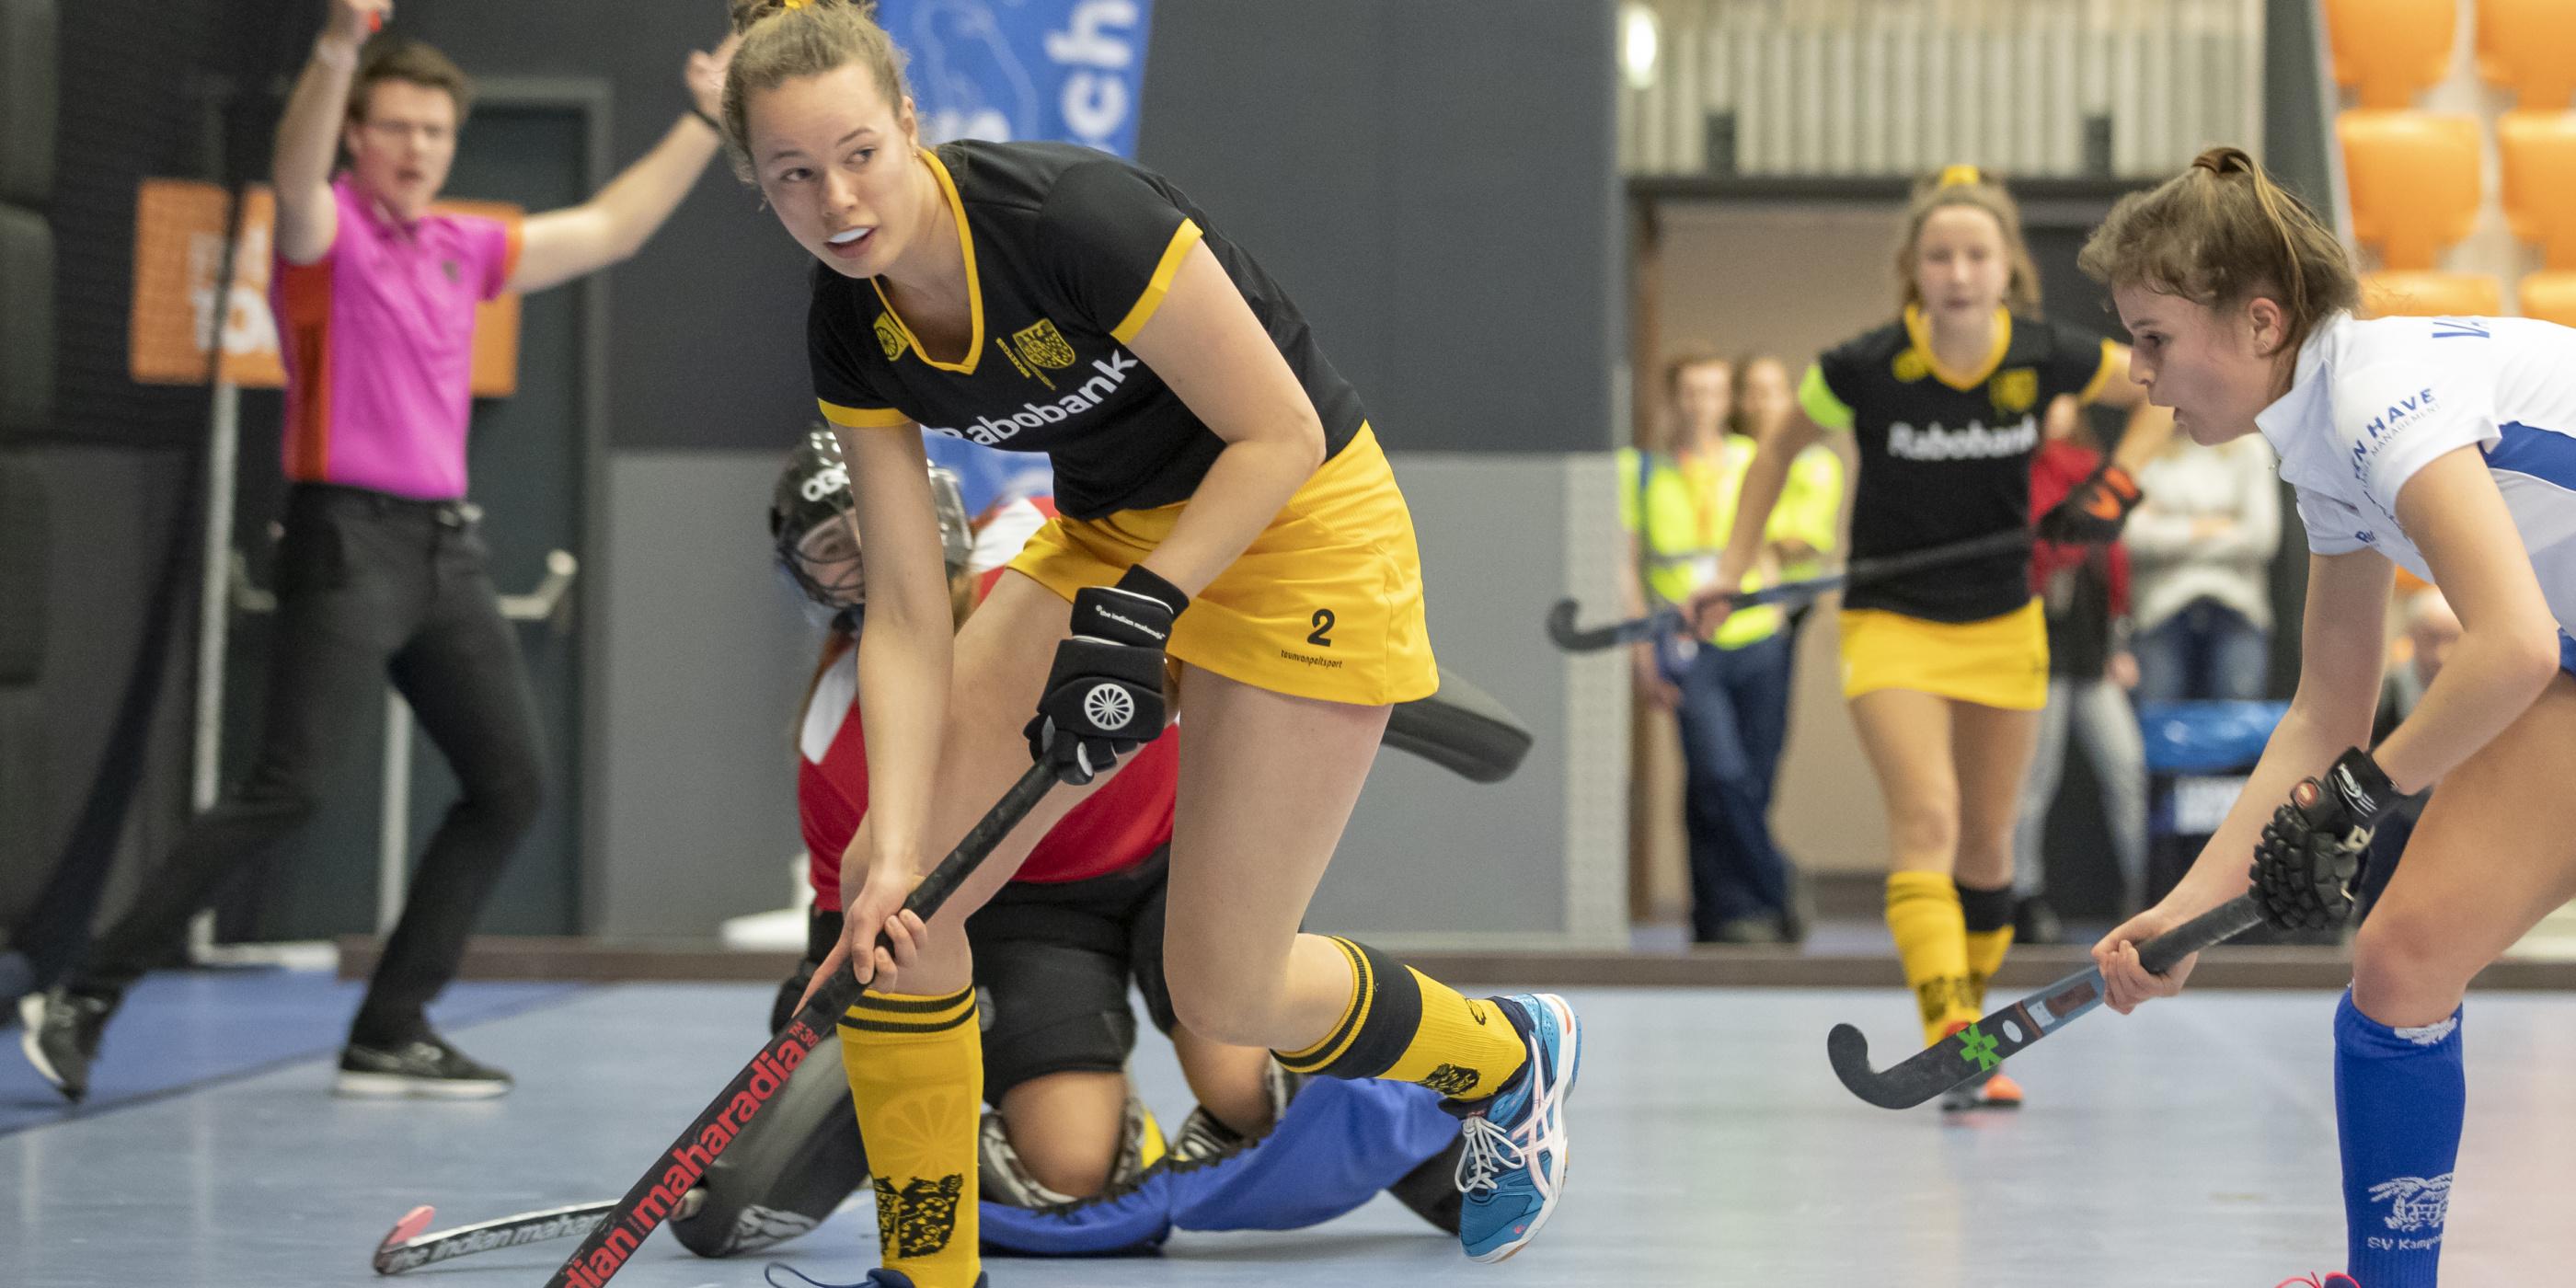 Indeling Hoofdklasse Zaalhockey seizoen 2020-2021